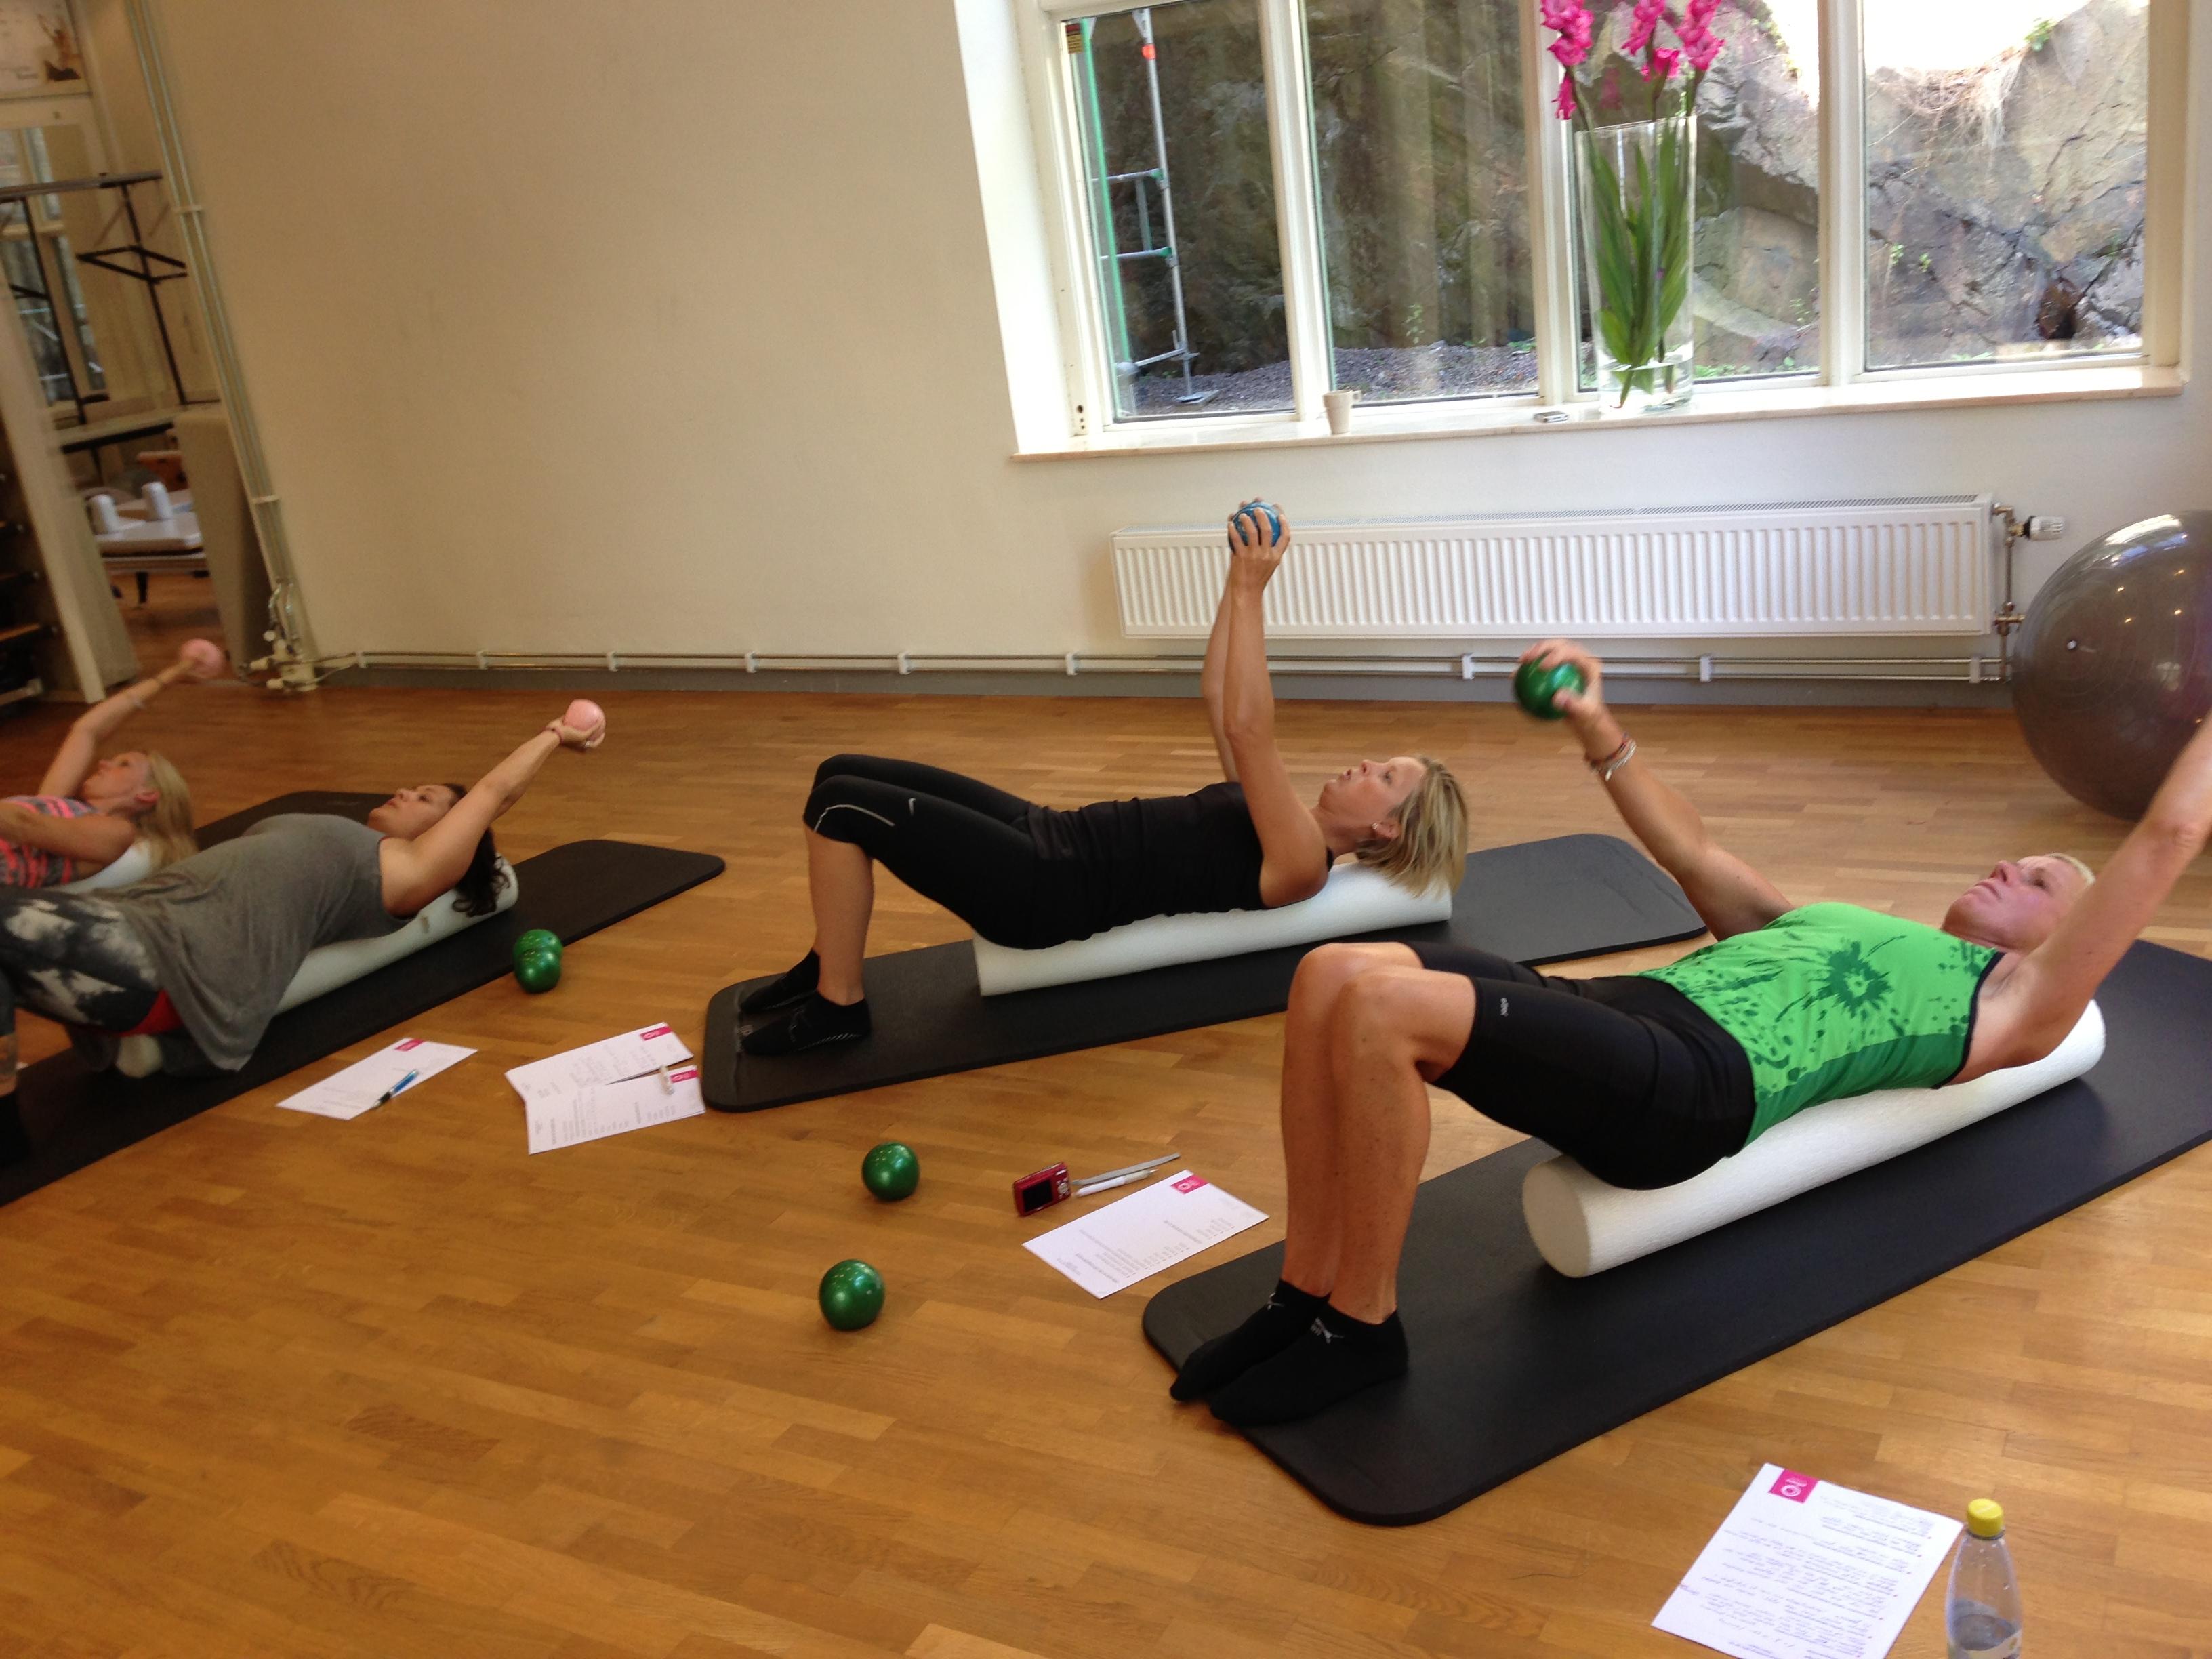 thai massage norrköping escort forum stockholm